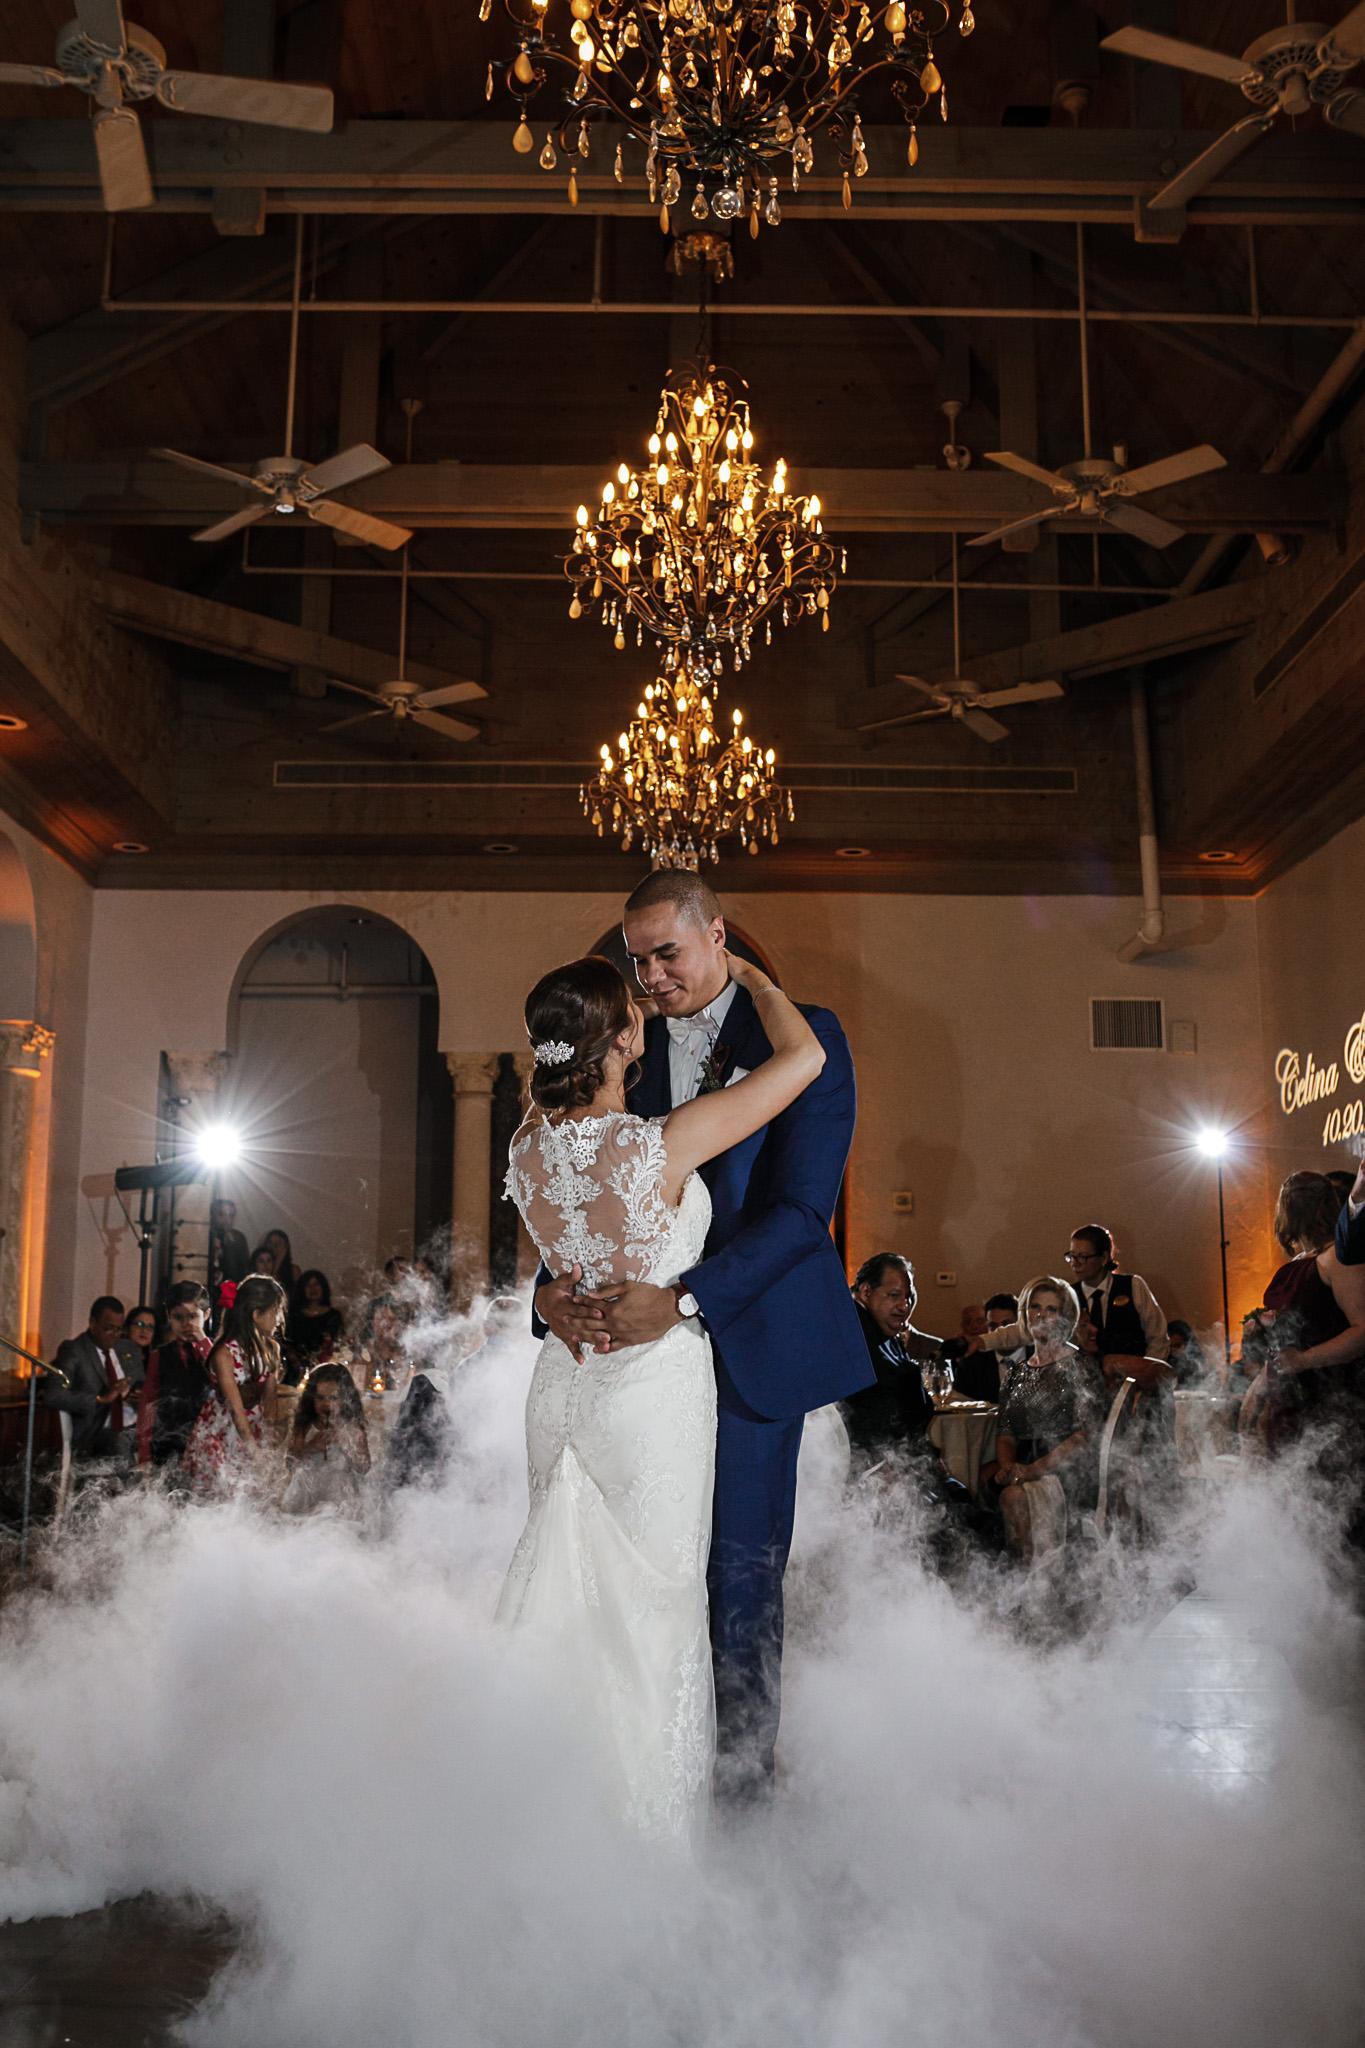 Miami-Wedding-Photographer-Coral-Gables-Venue-First-Dance